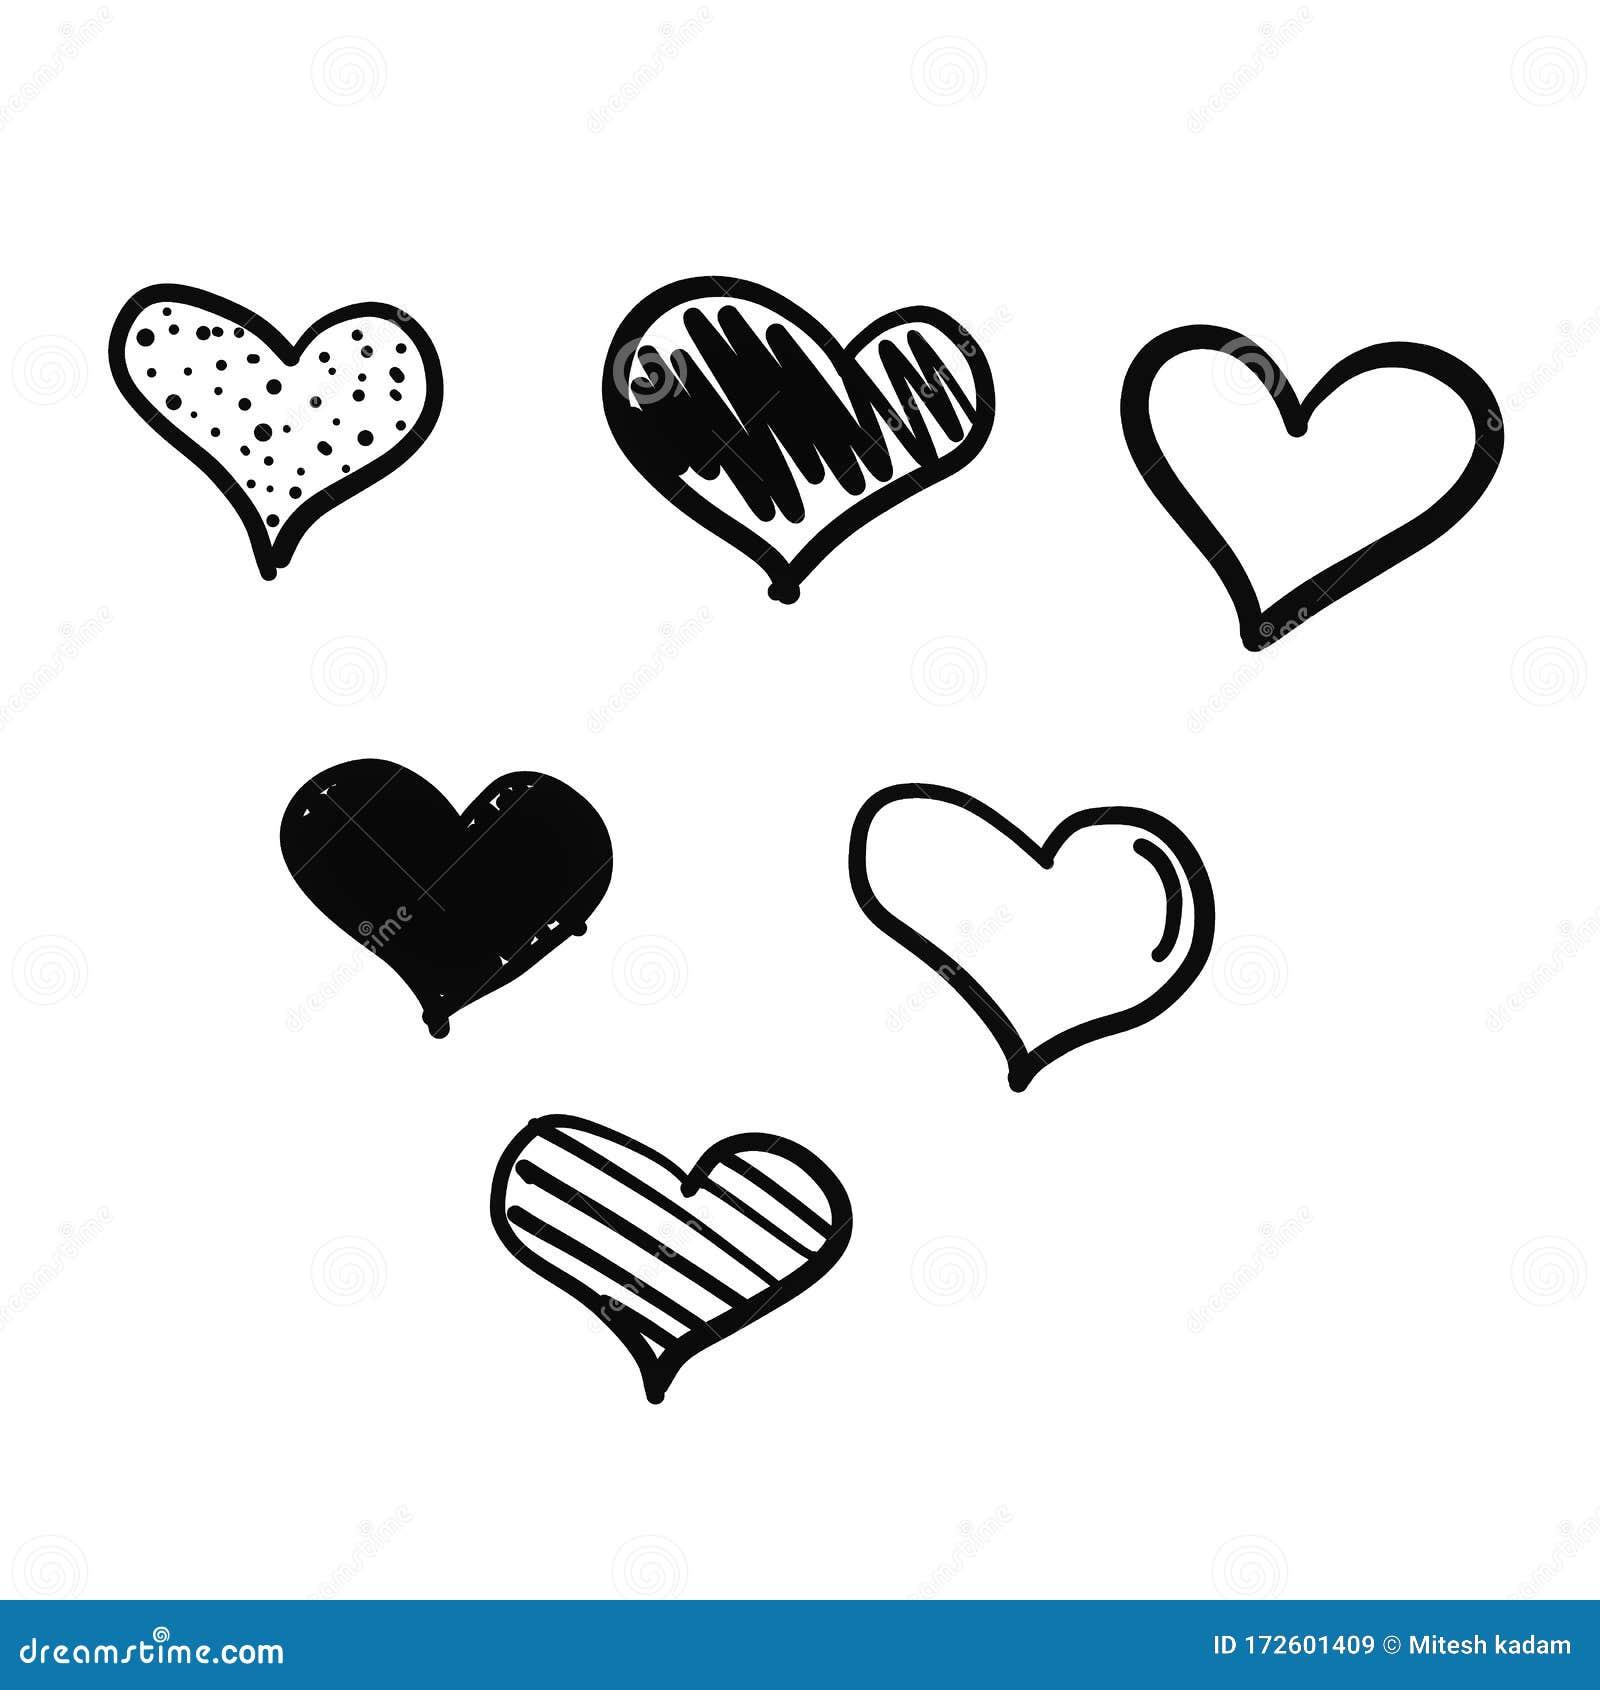 Beautiful Black Symbols Of Hearts Happy Valentines Day For Love Of Life Black Love Black Love Symbols Stock Illustration Illustration Of Life Emoji 172601409